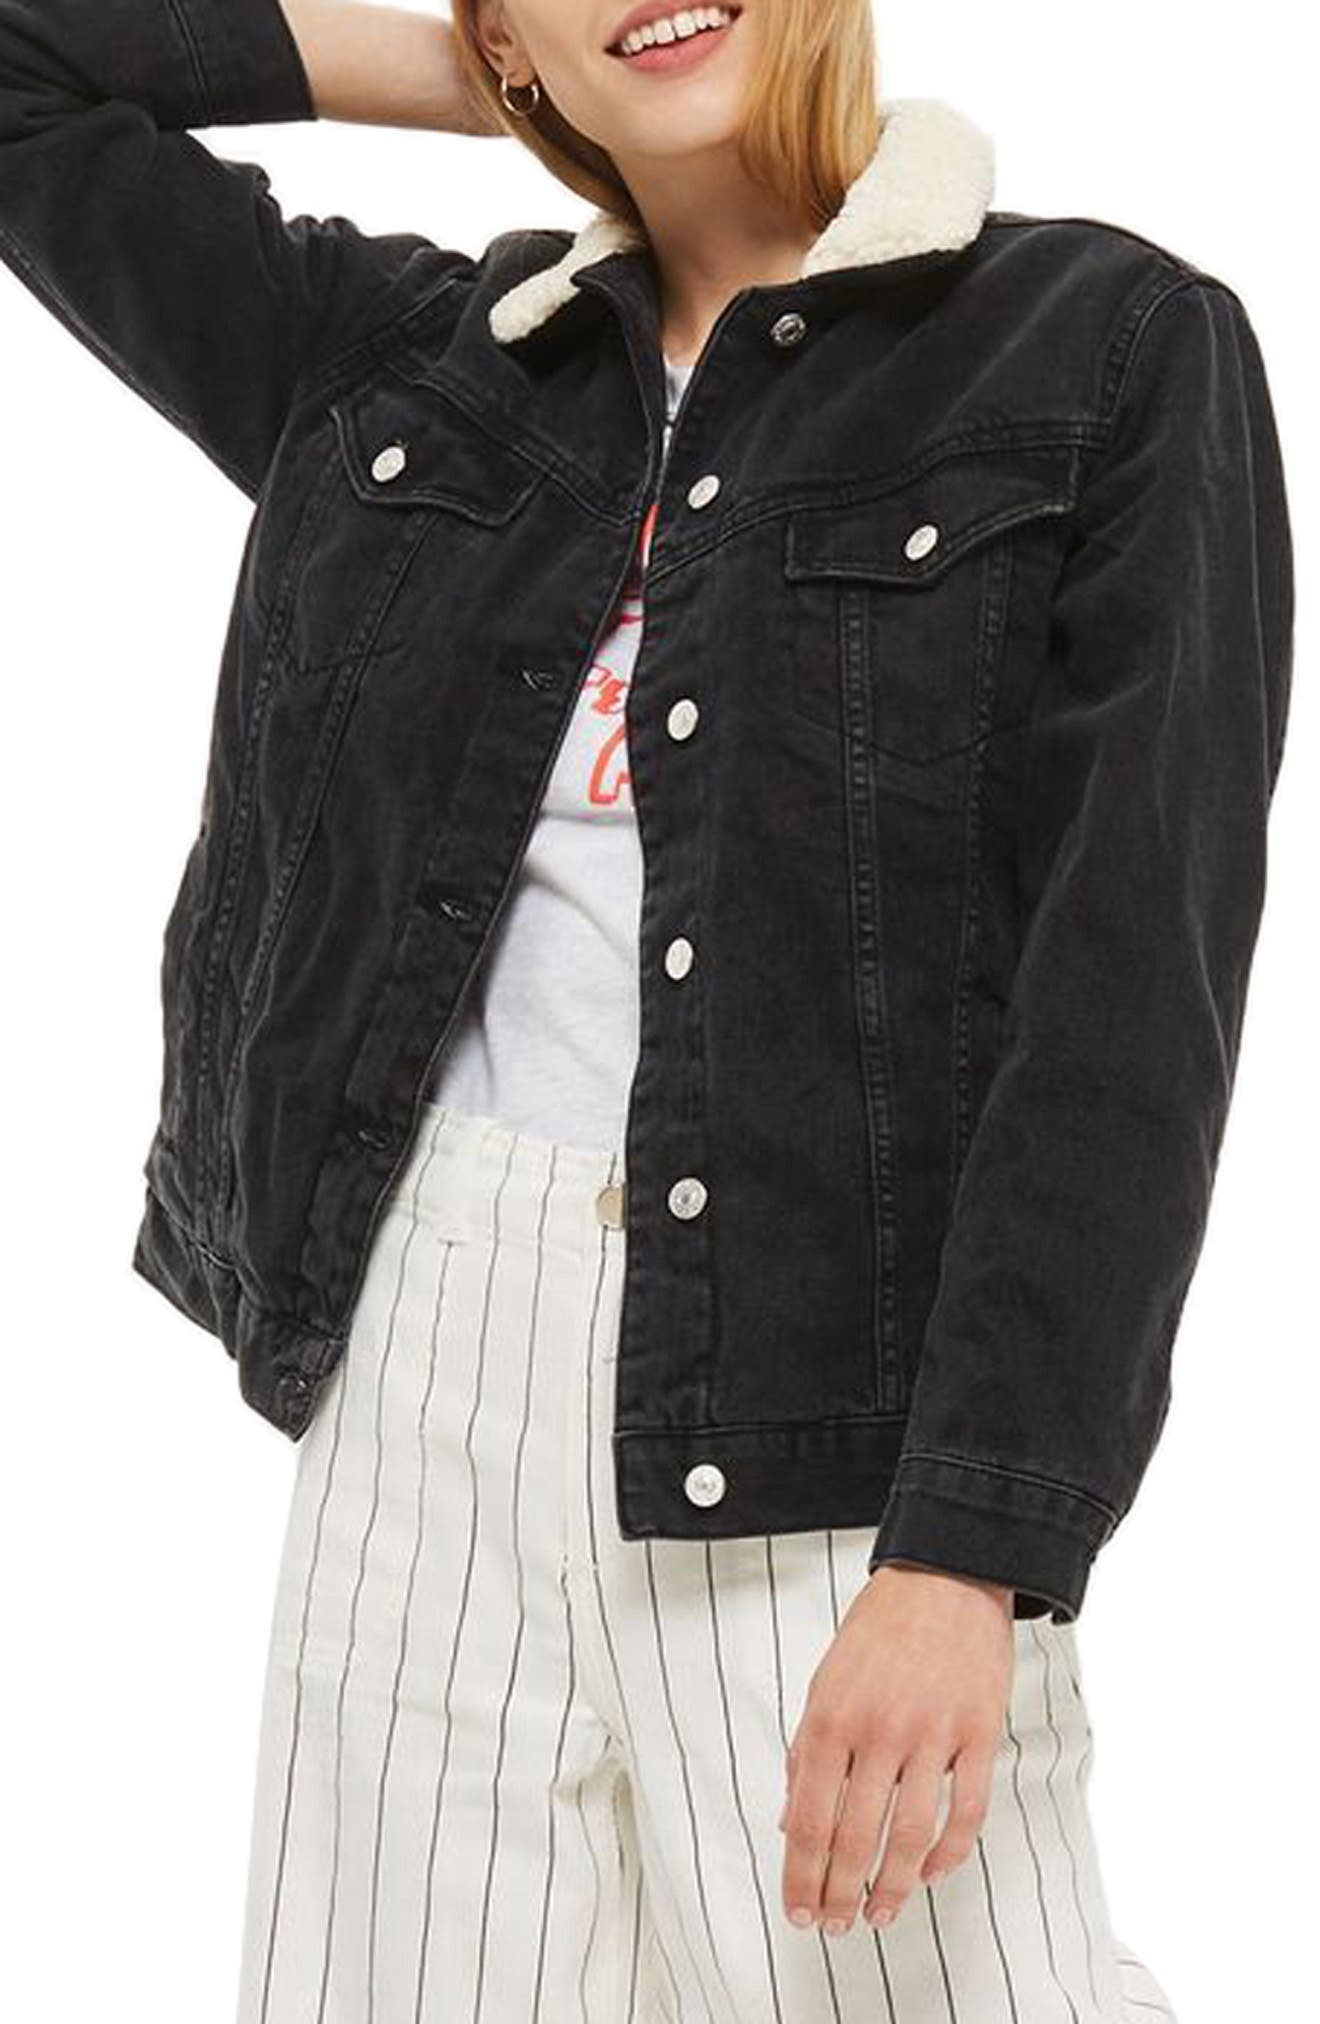 Alternate Image 1 Selected - Topshop Borg Oversize Denim Jacket